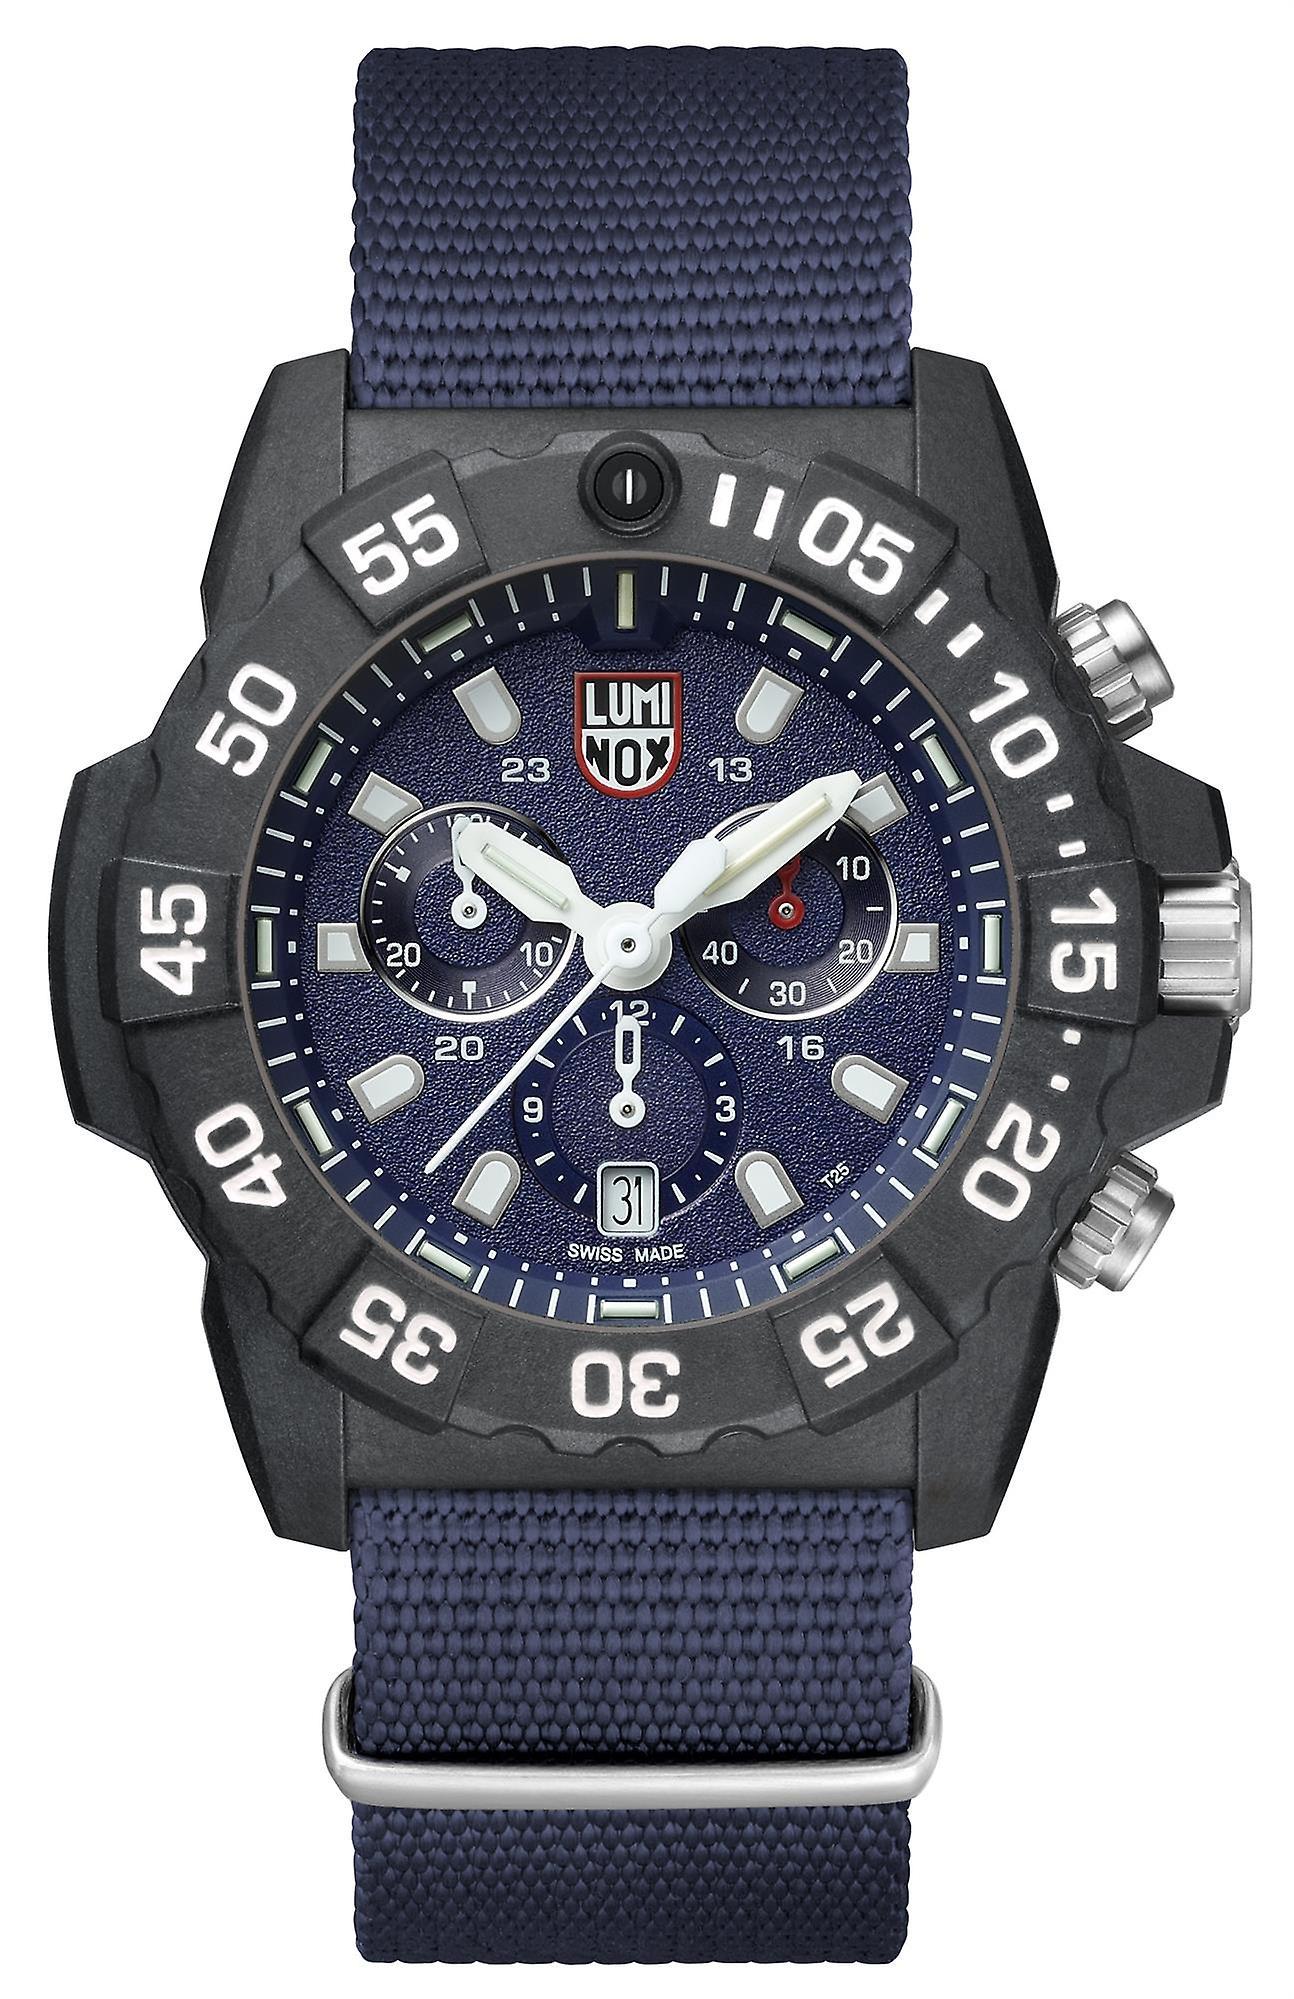 Luninox Navy SEAL Chronograph 3580 Series Blue Canvas Strap Men's Watch XS.3583.ND